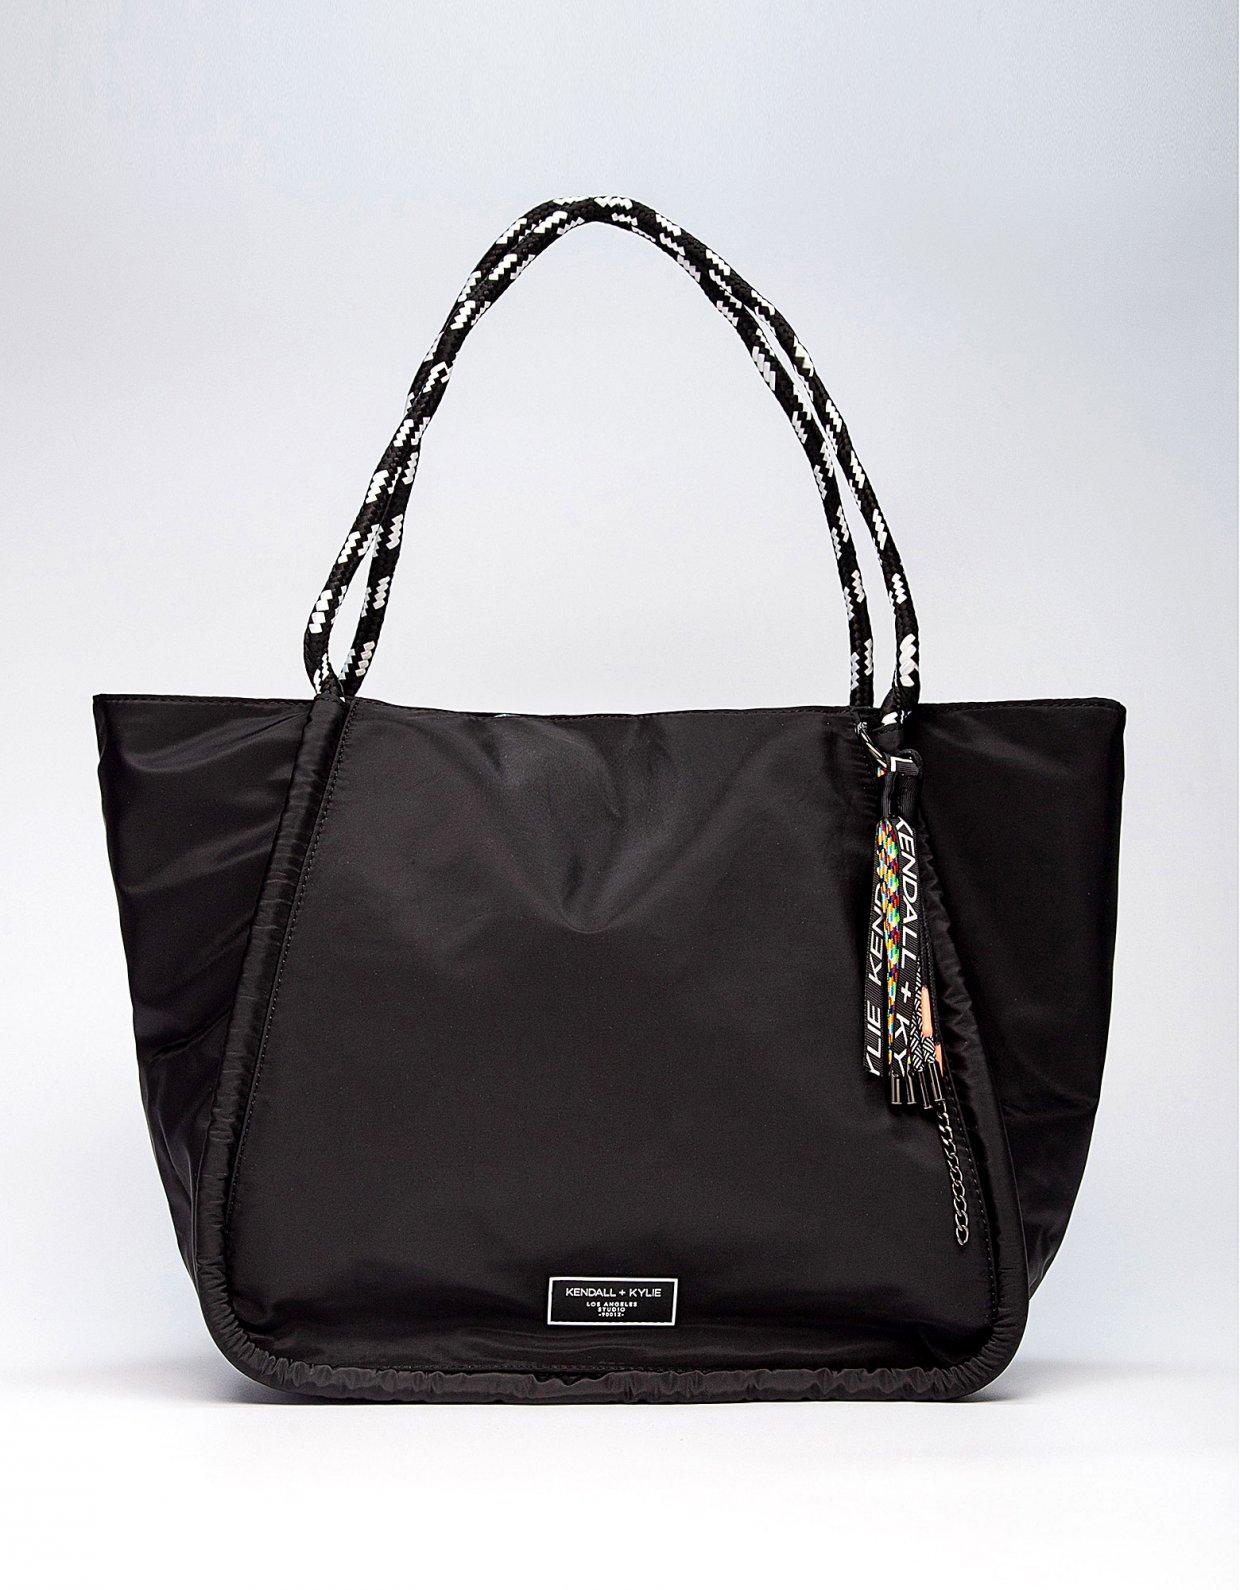 Kendall + Kylie Emily shopper bag